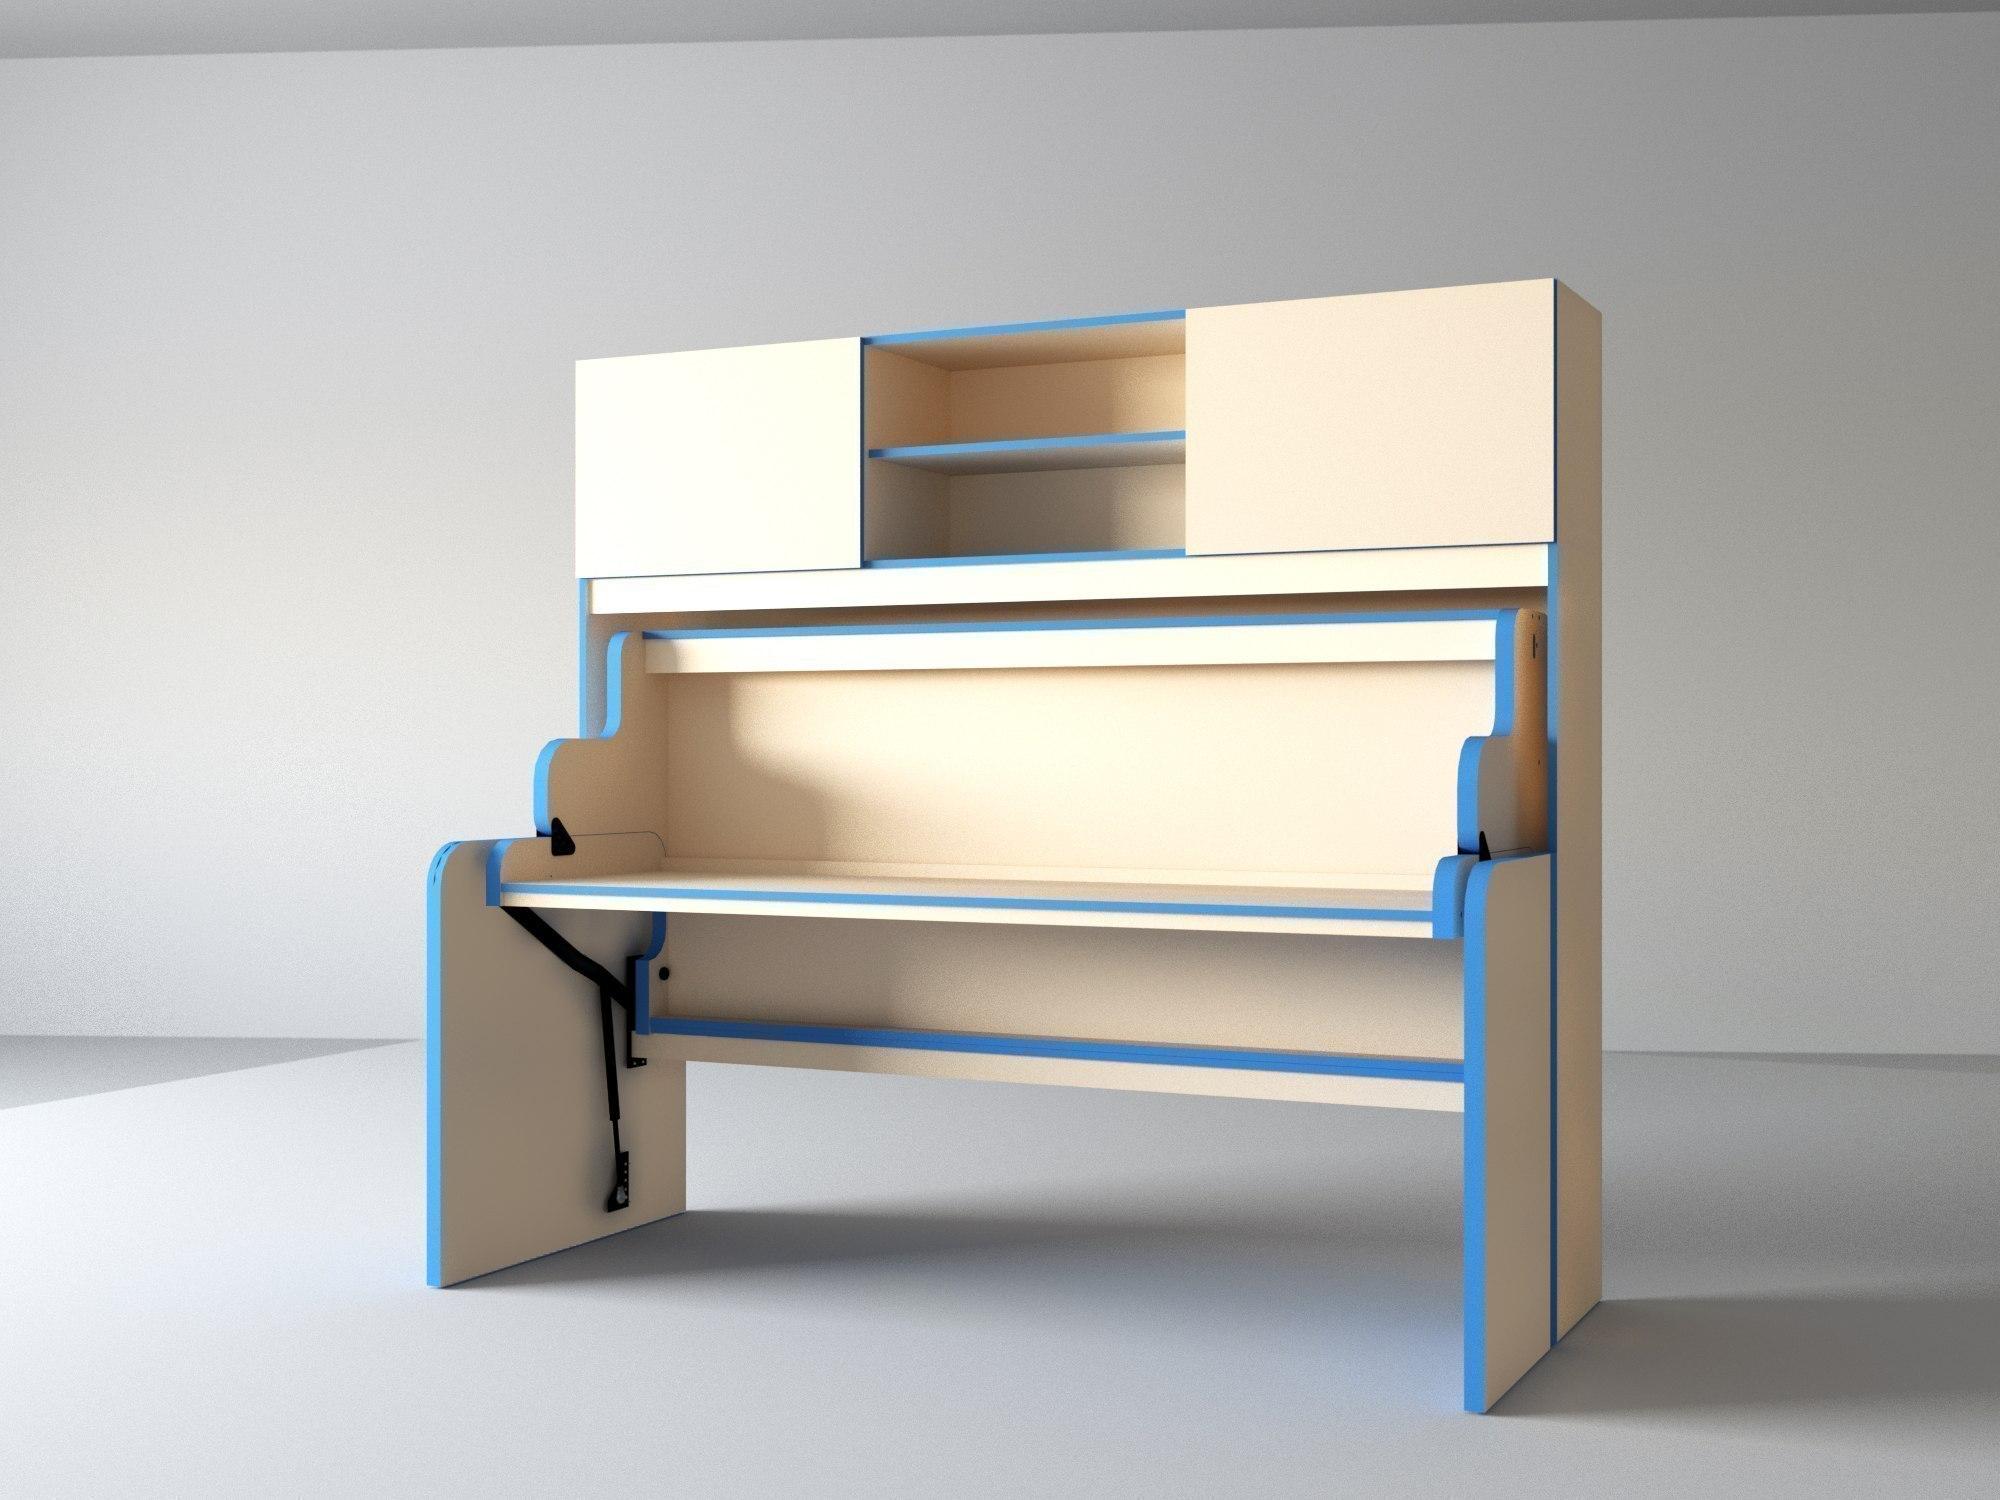 Фриланс разработка мебели иконка удаленная работа